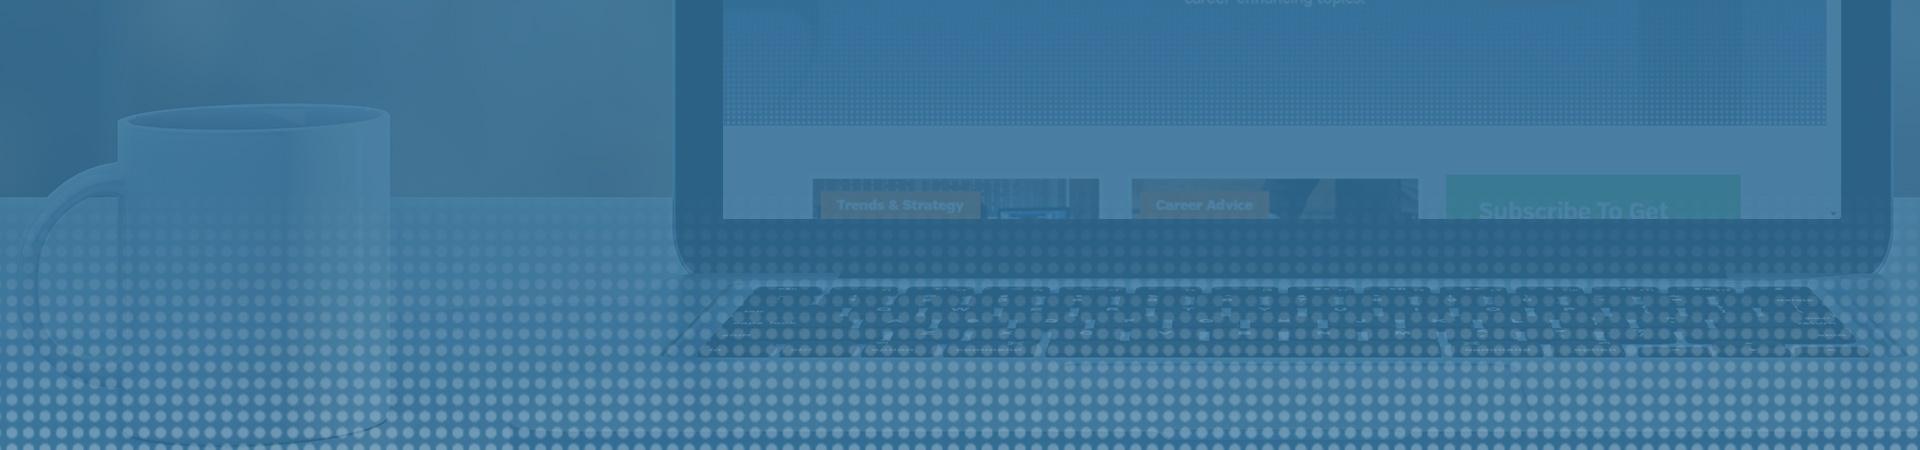 RSS Blog HeaderV2.jpg